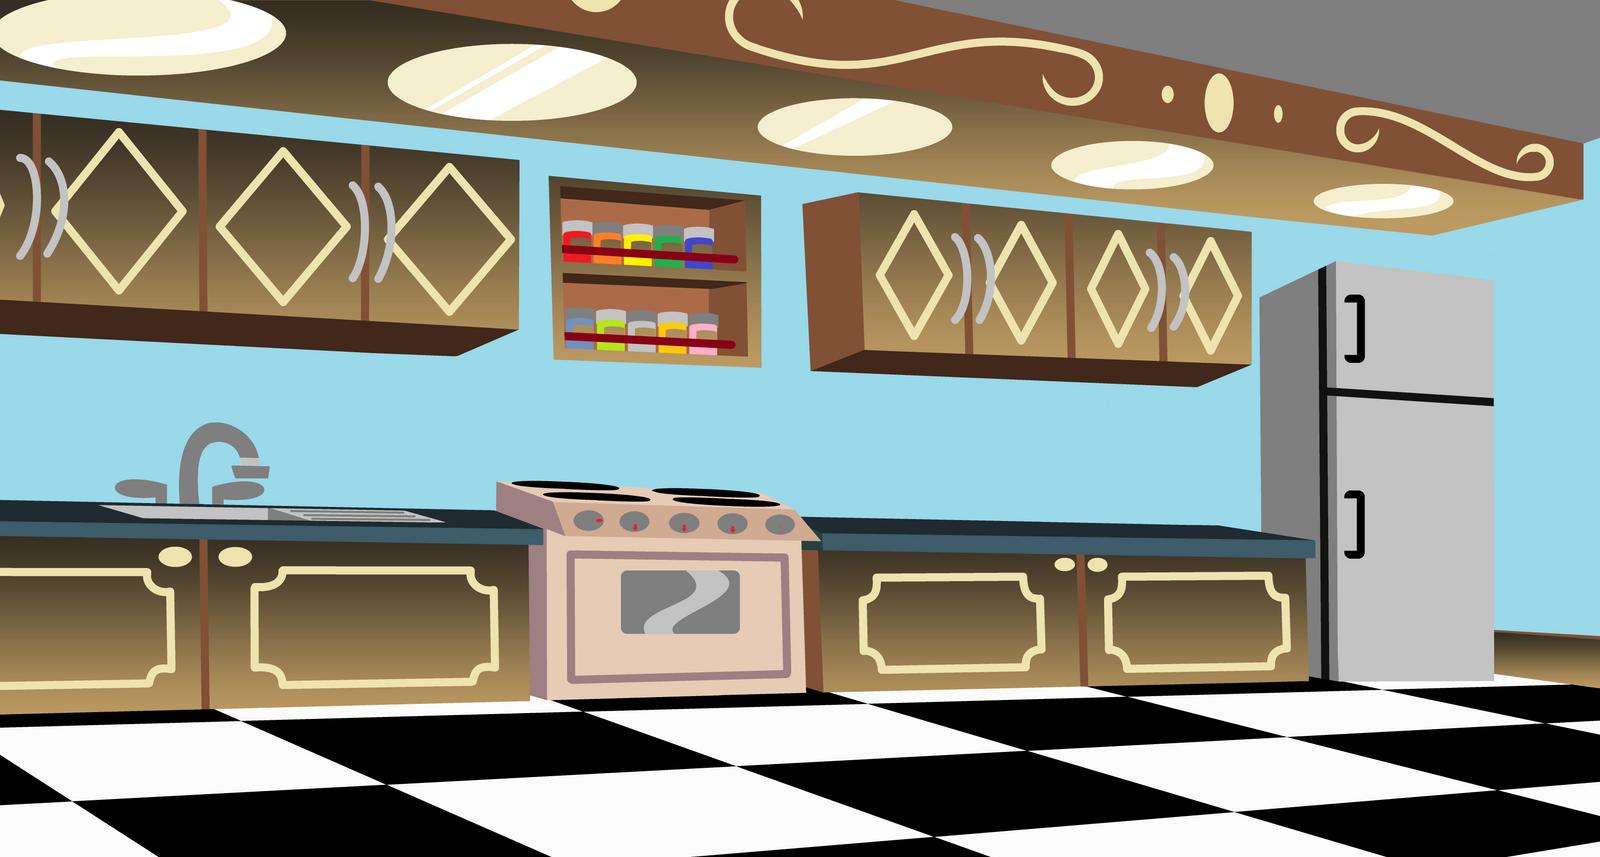 89+ Restaurant Kitchen Animated - The Restaurant Designed In Close ...